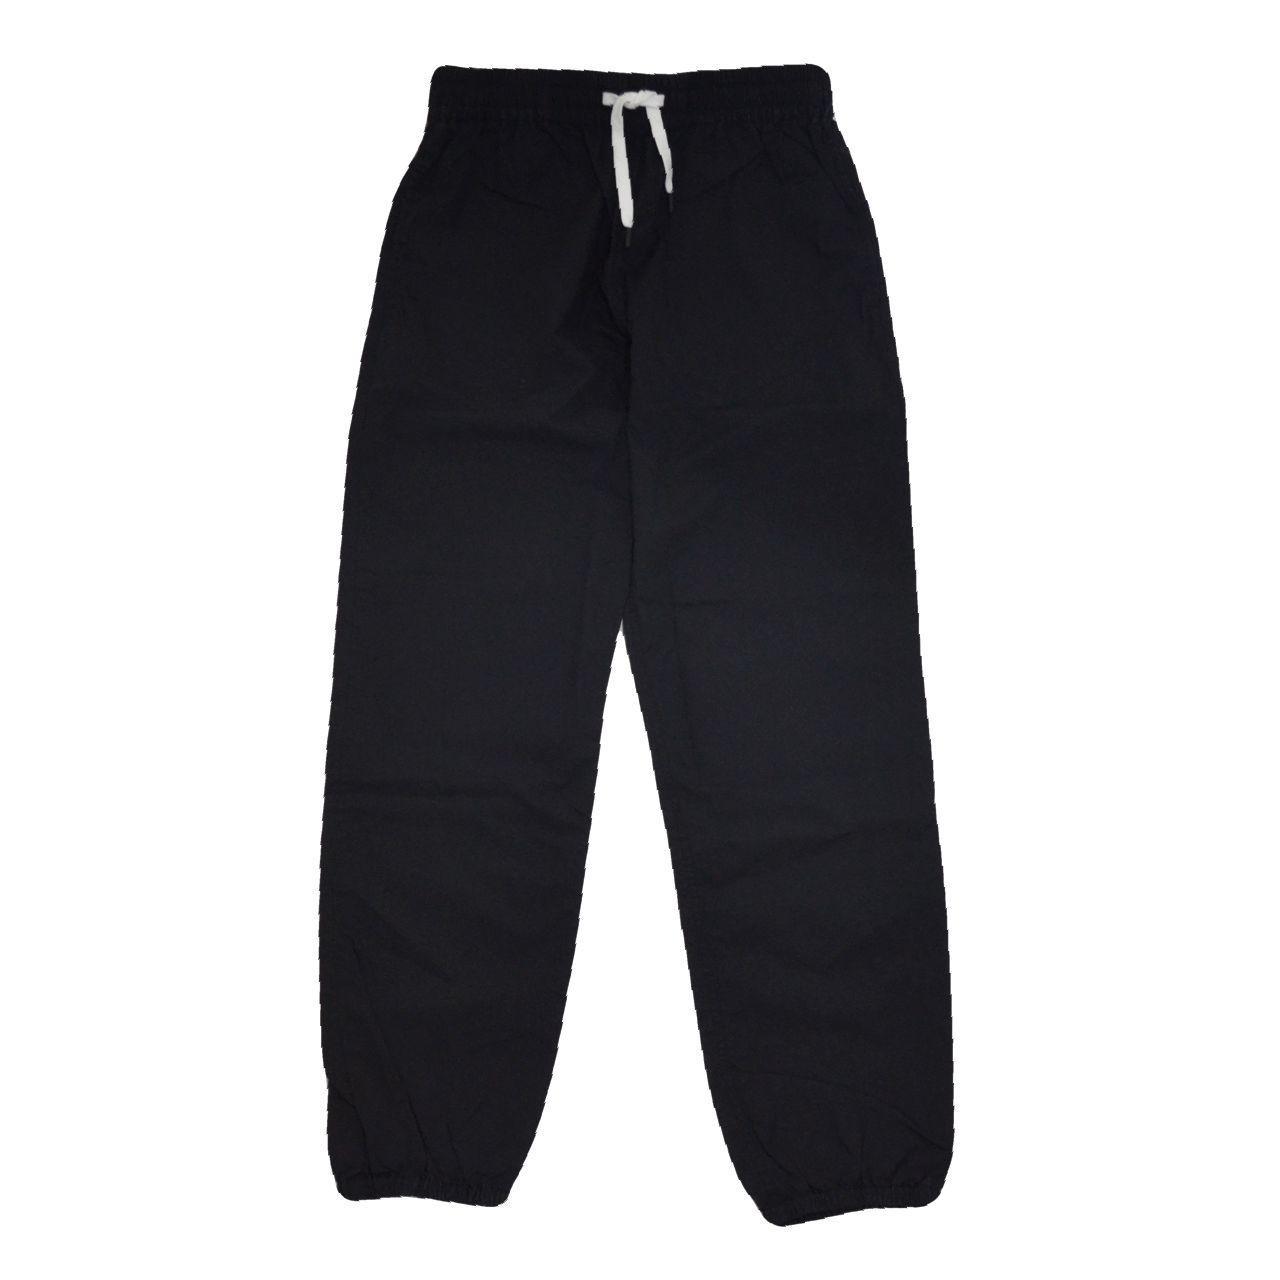 THE QUIET LIFE JOGGER PANTS (BEACH) BLACK